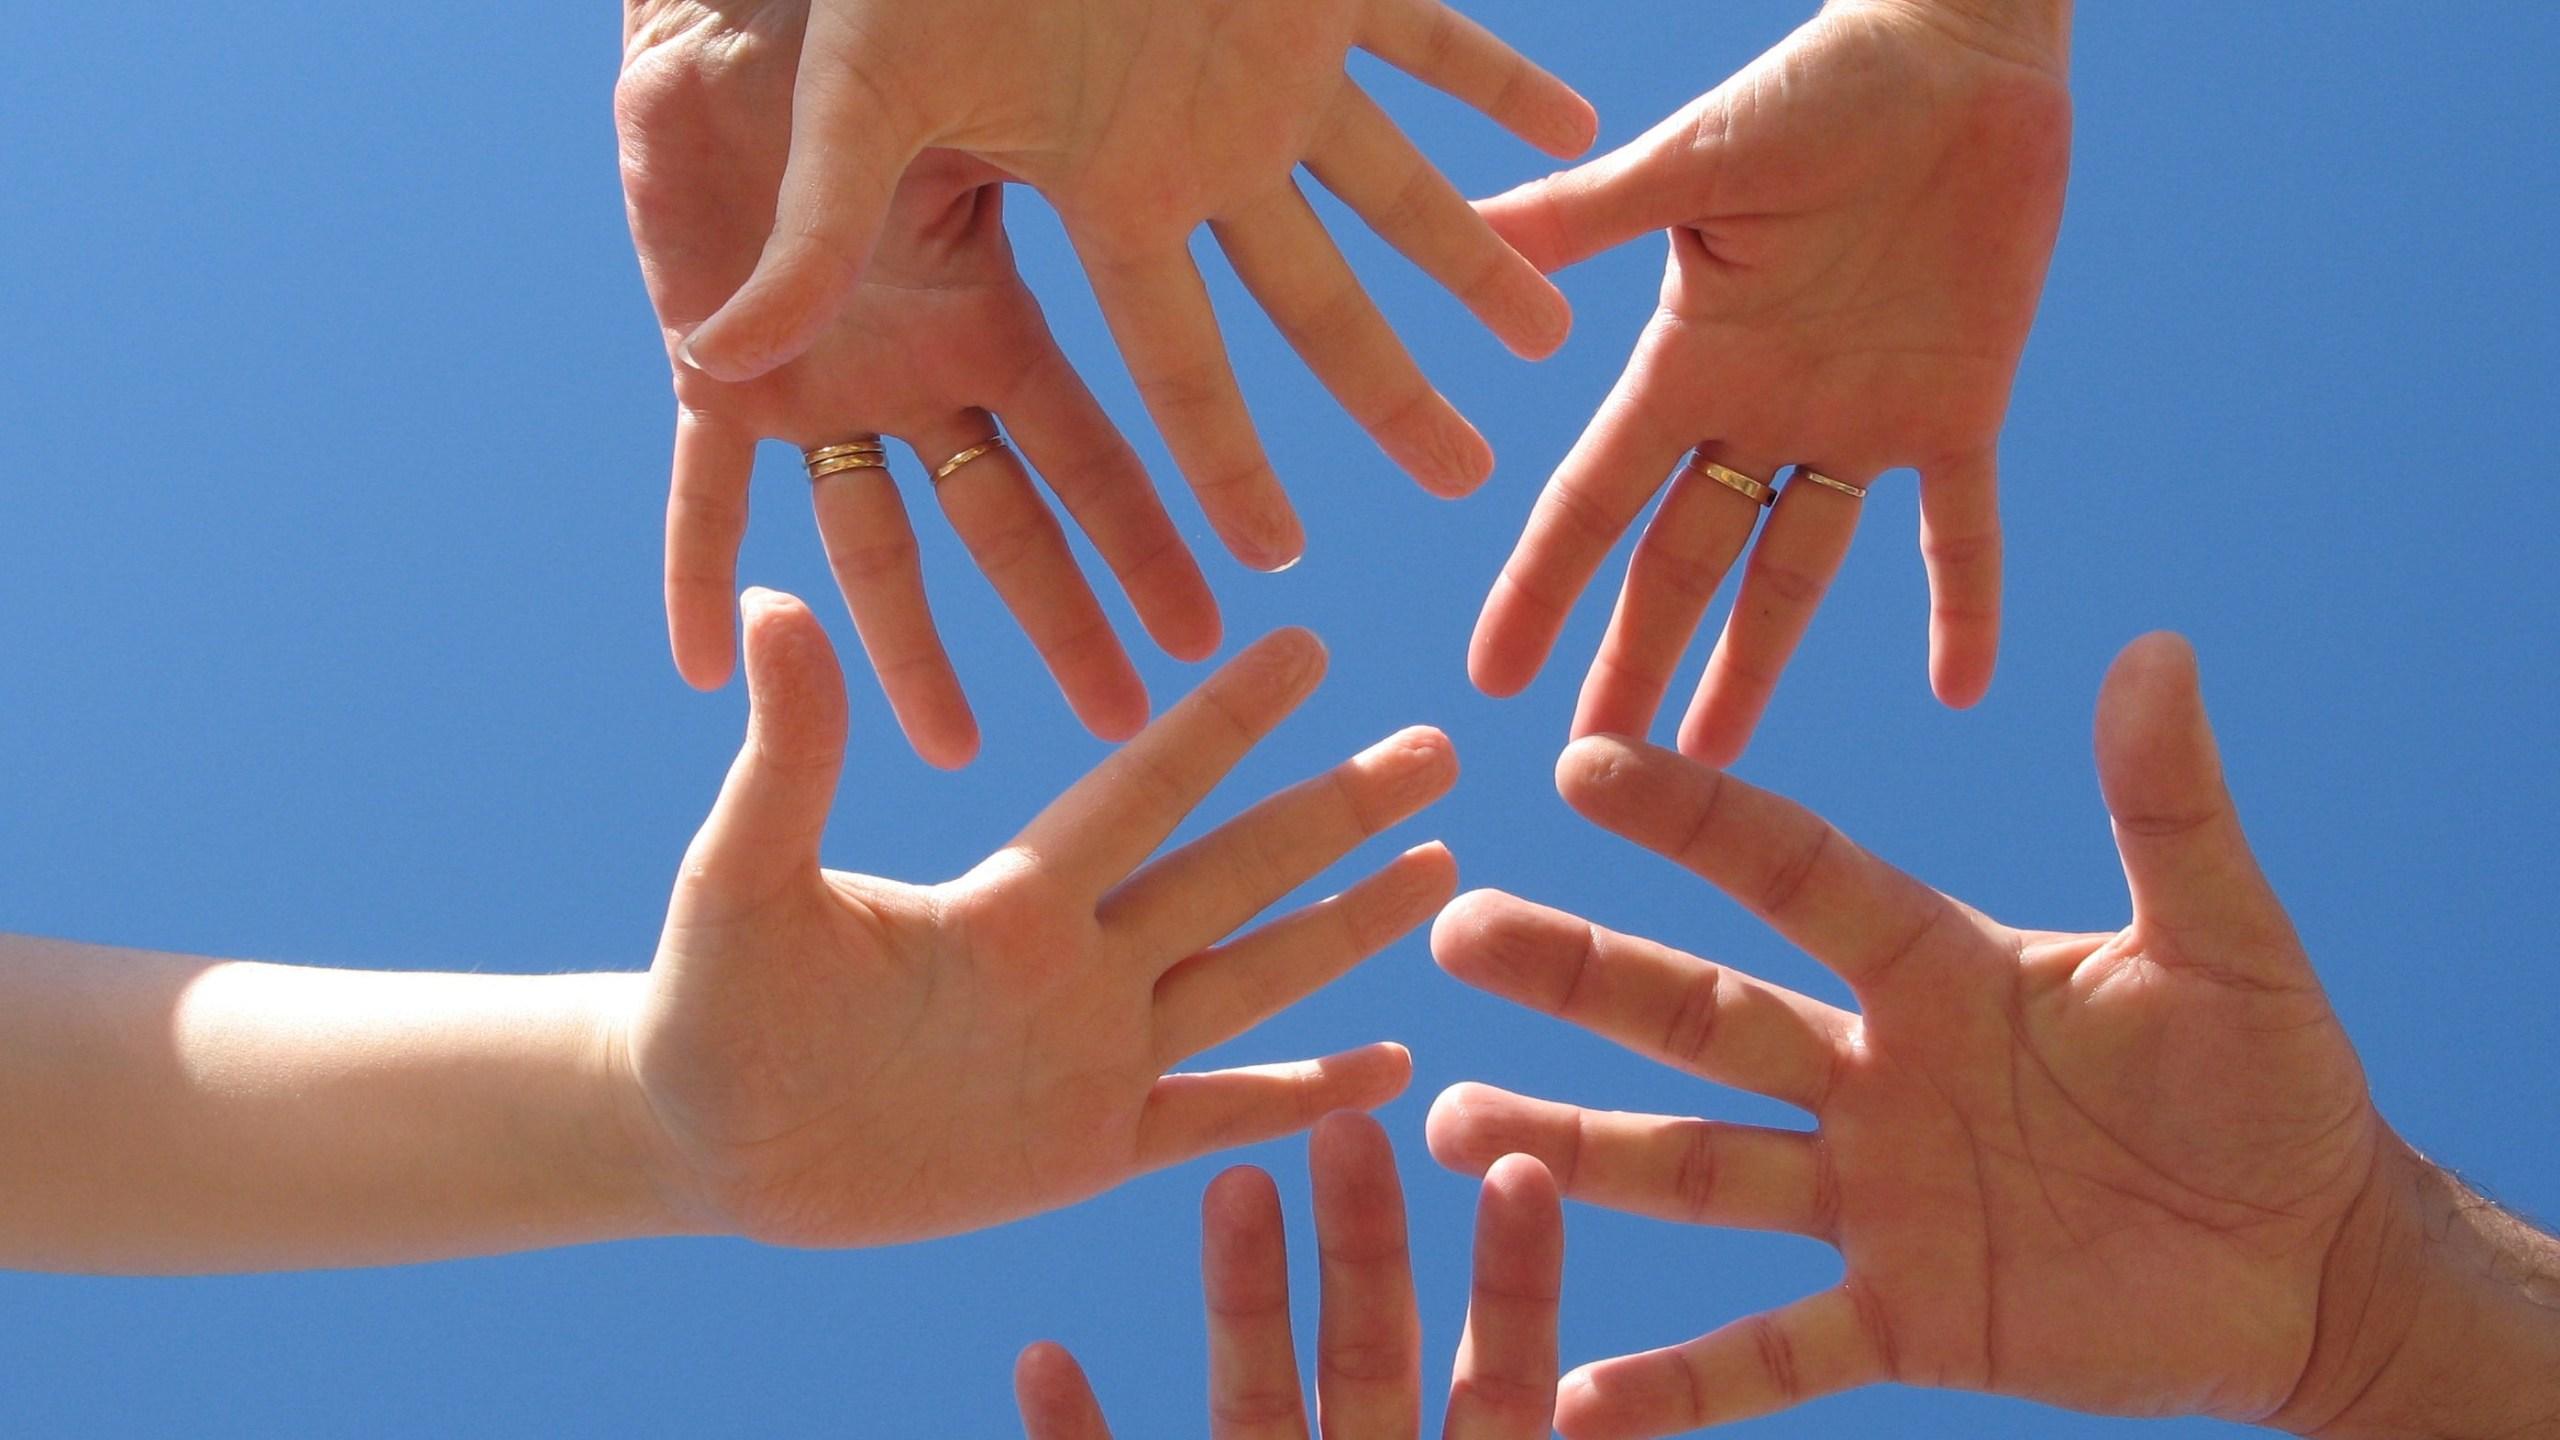 helping_hands_1535484017186.jpg